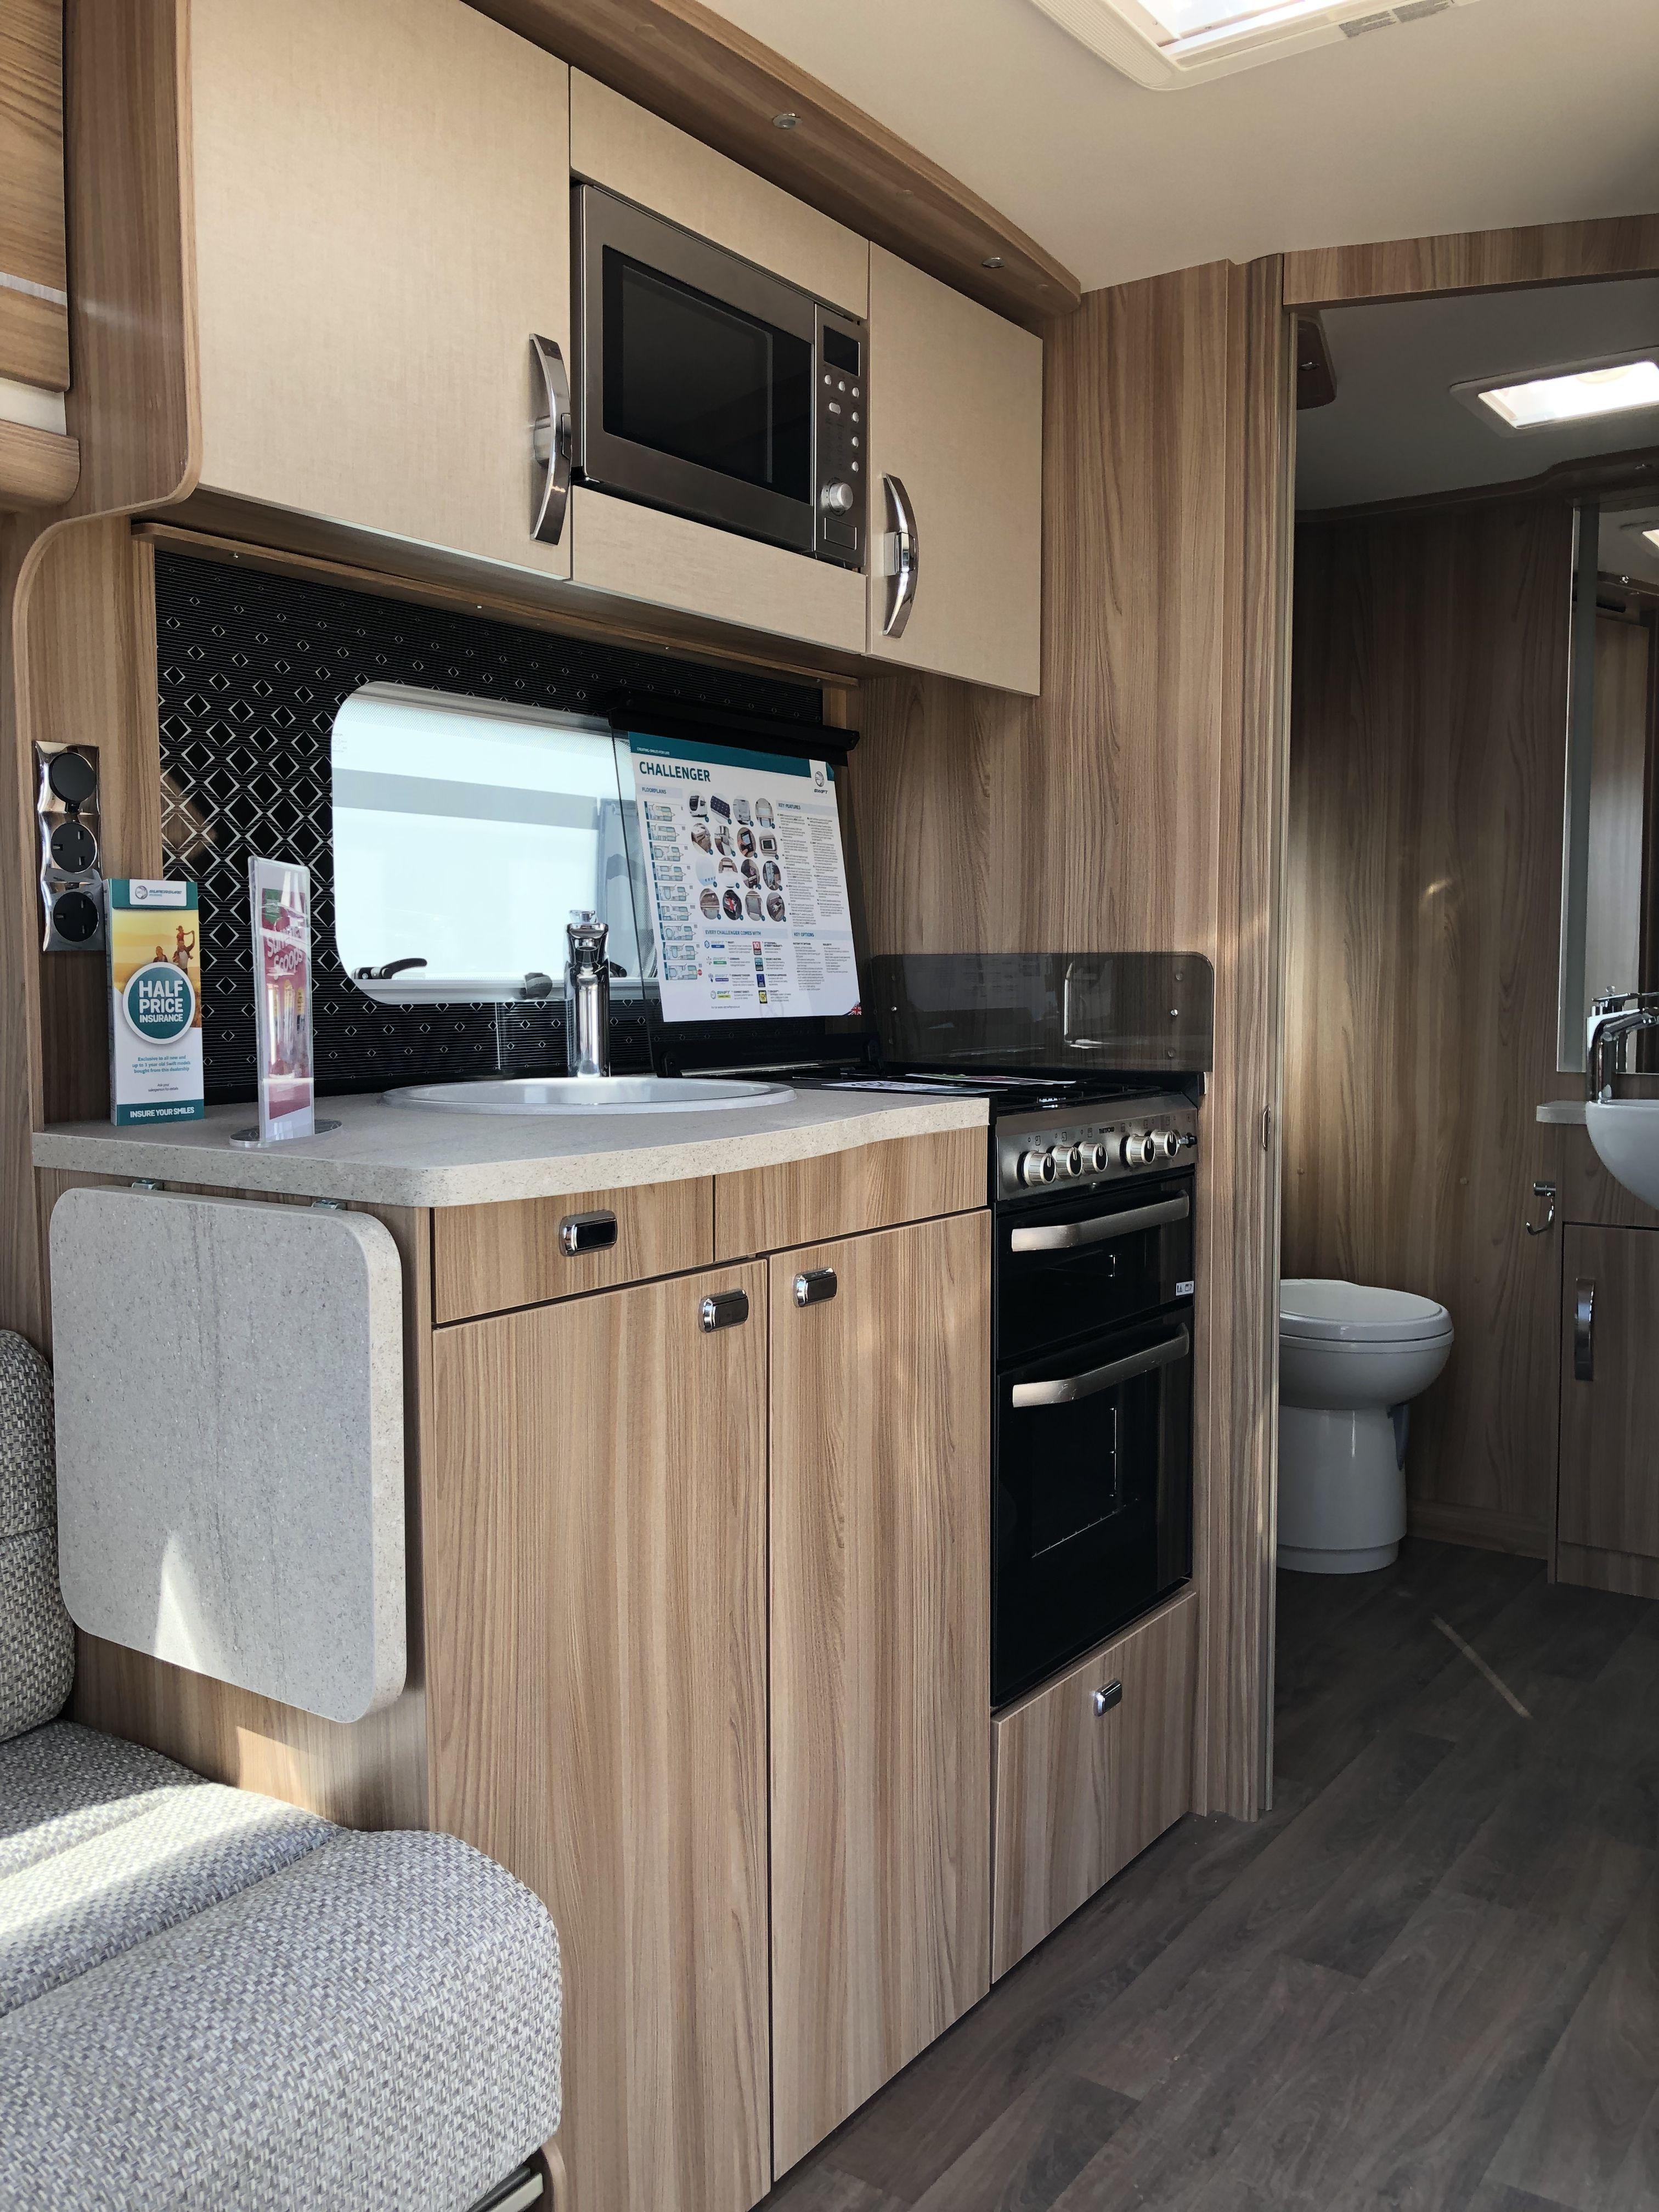 Kitchen image by Stuffannonsense on Caravans, little